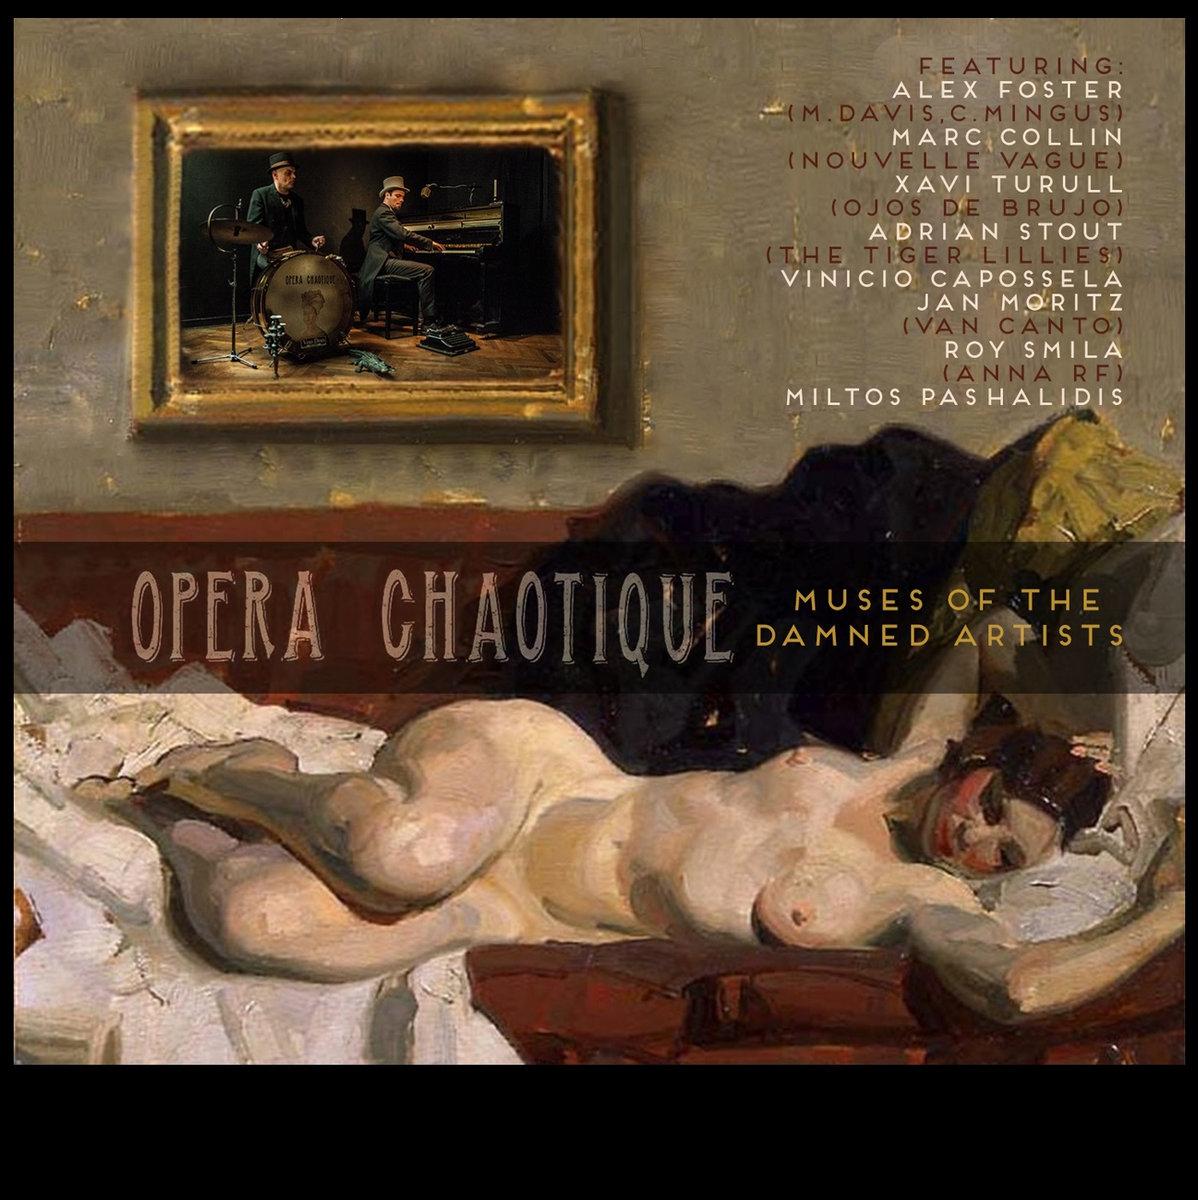 Ladies Of Avignon Ft Xavi Turull Ojos De Brujo Opera Chaotique